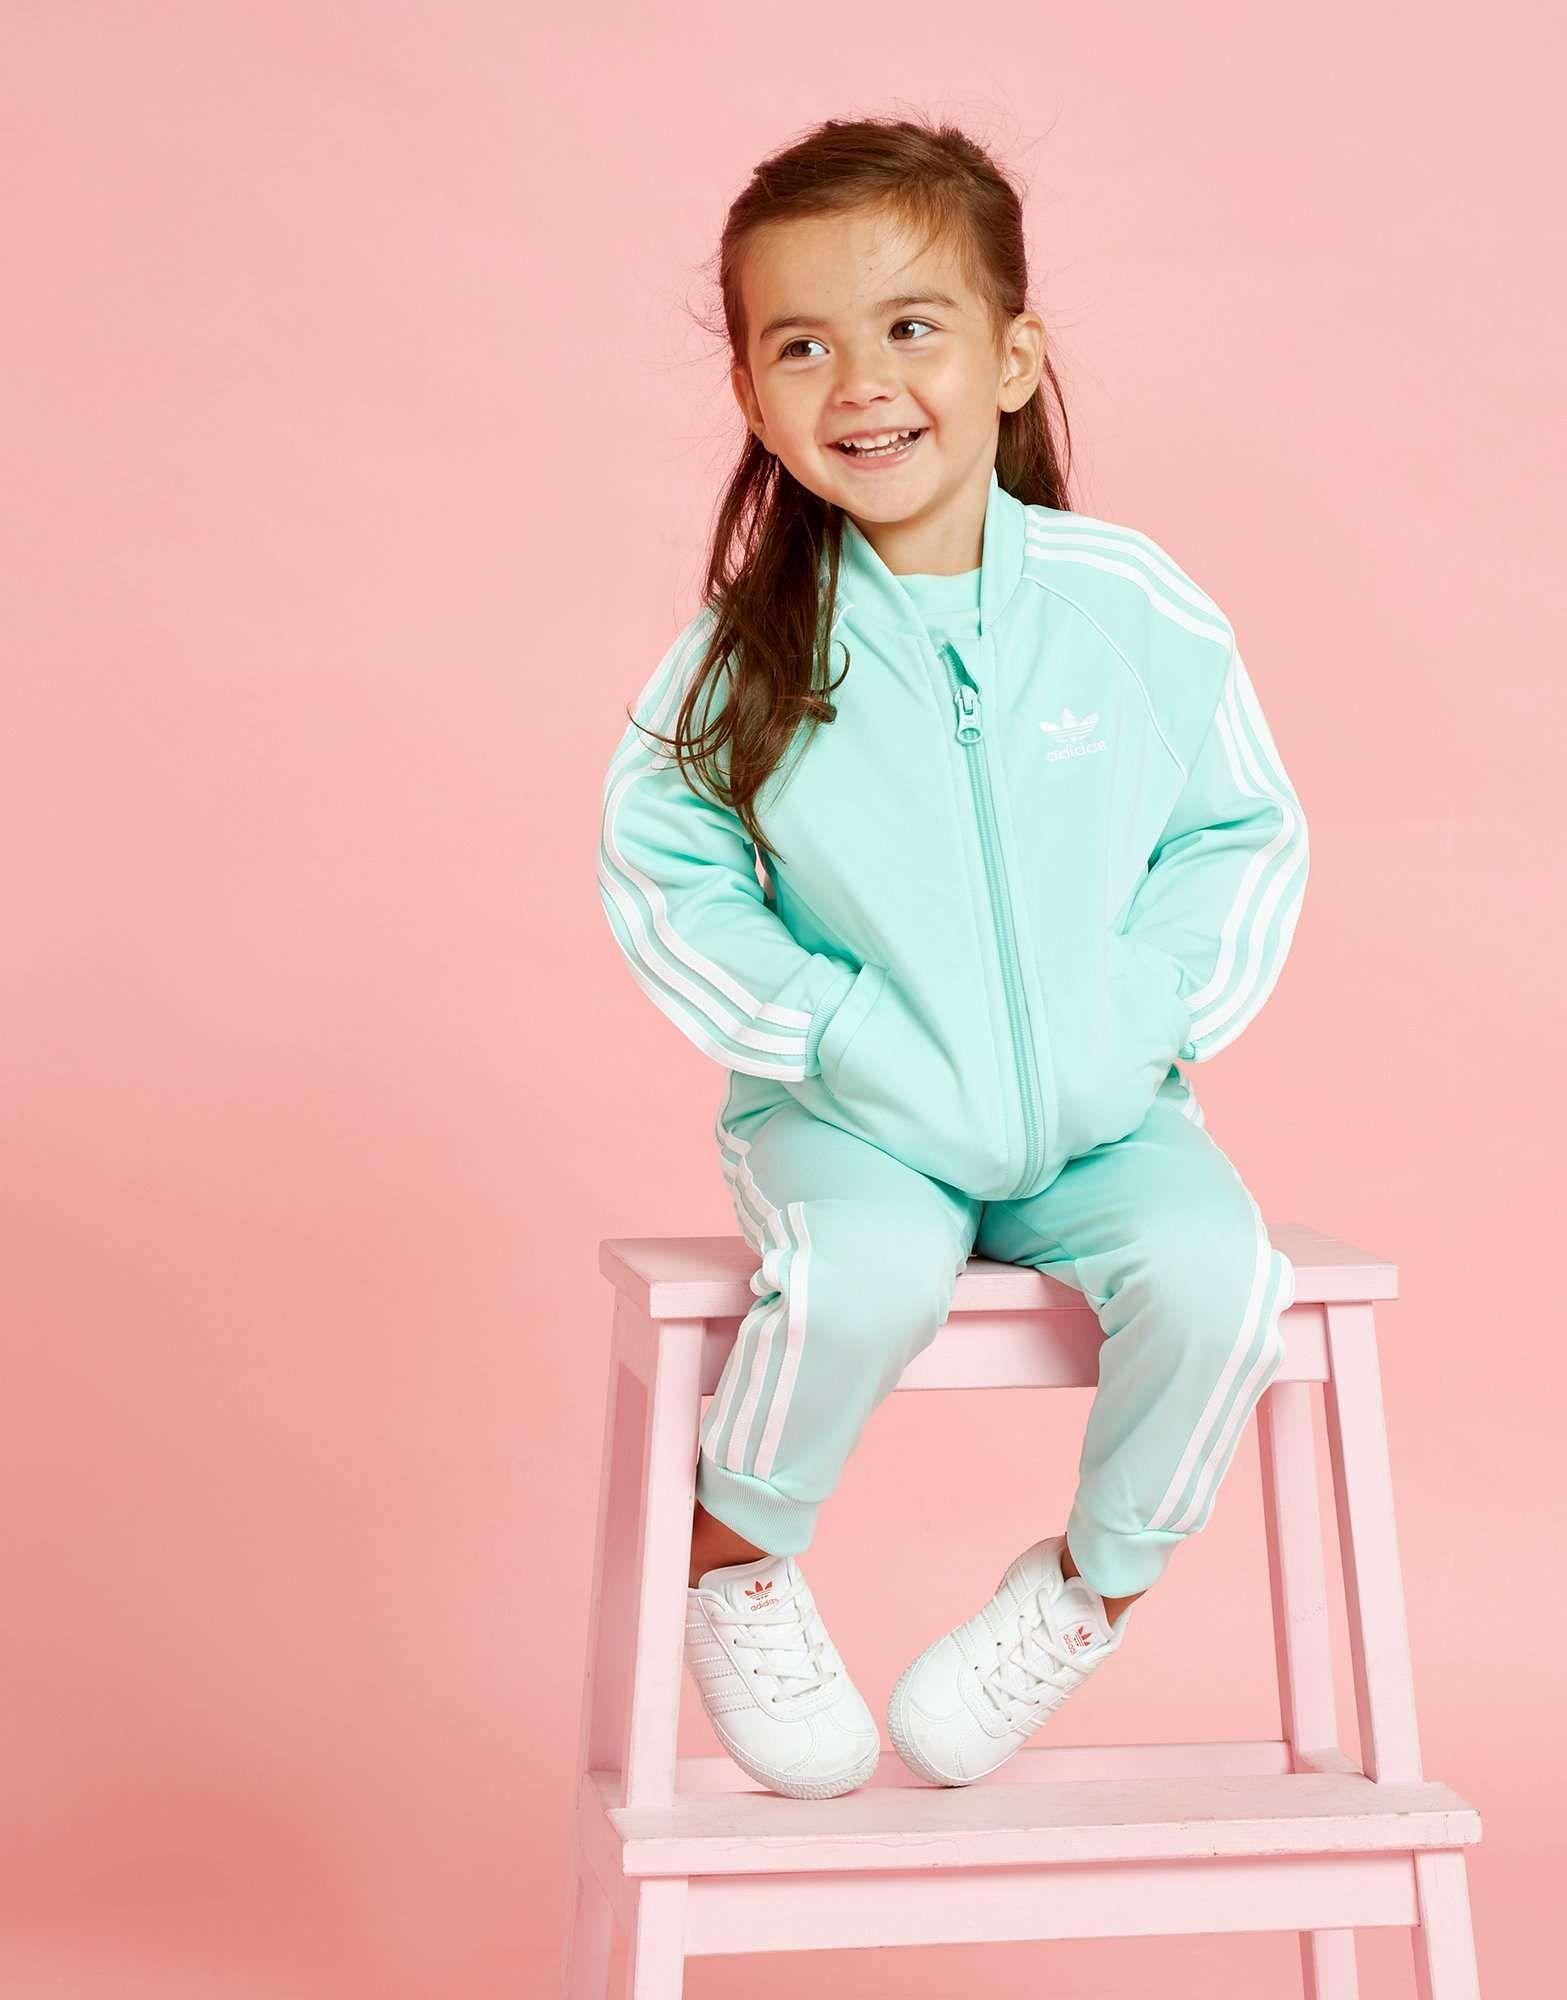 b6cc5d87164a1 adidas Originals Girls  Superstar Tracksuit Infant - Shop online for adidas  Originals Girls  Superstar Tracksuit Infant with JD Sports